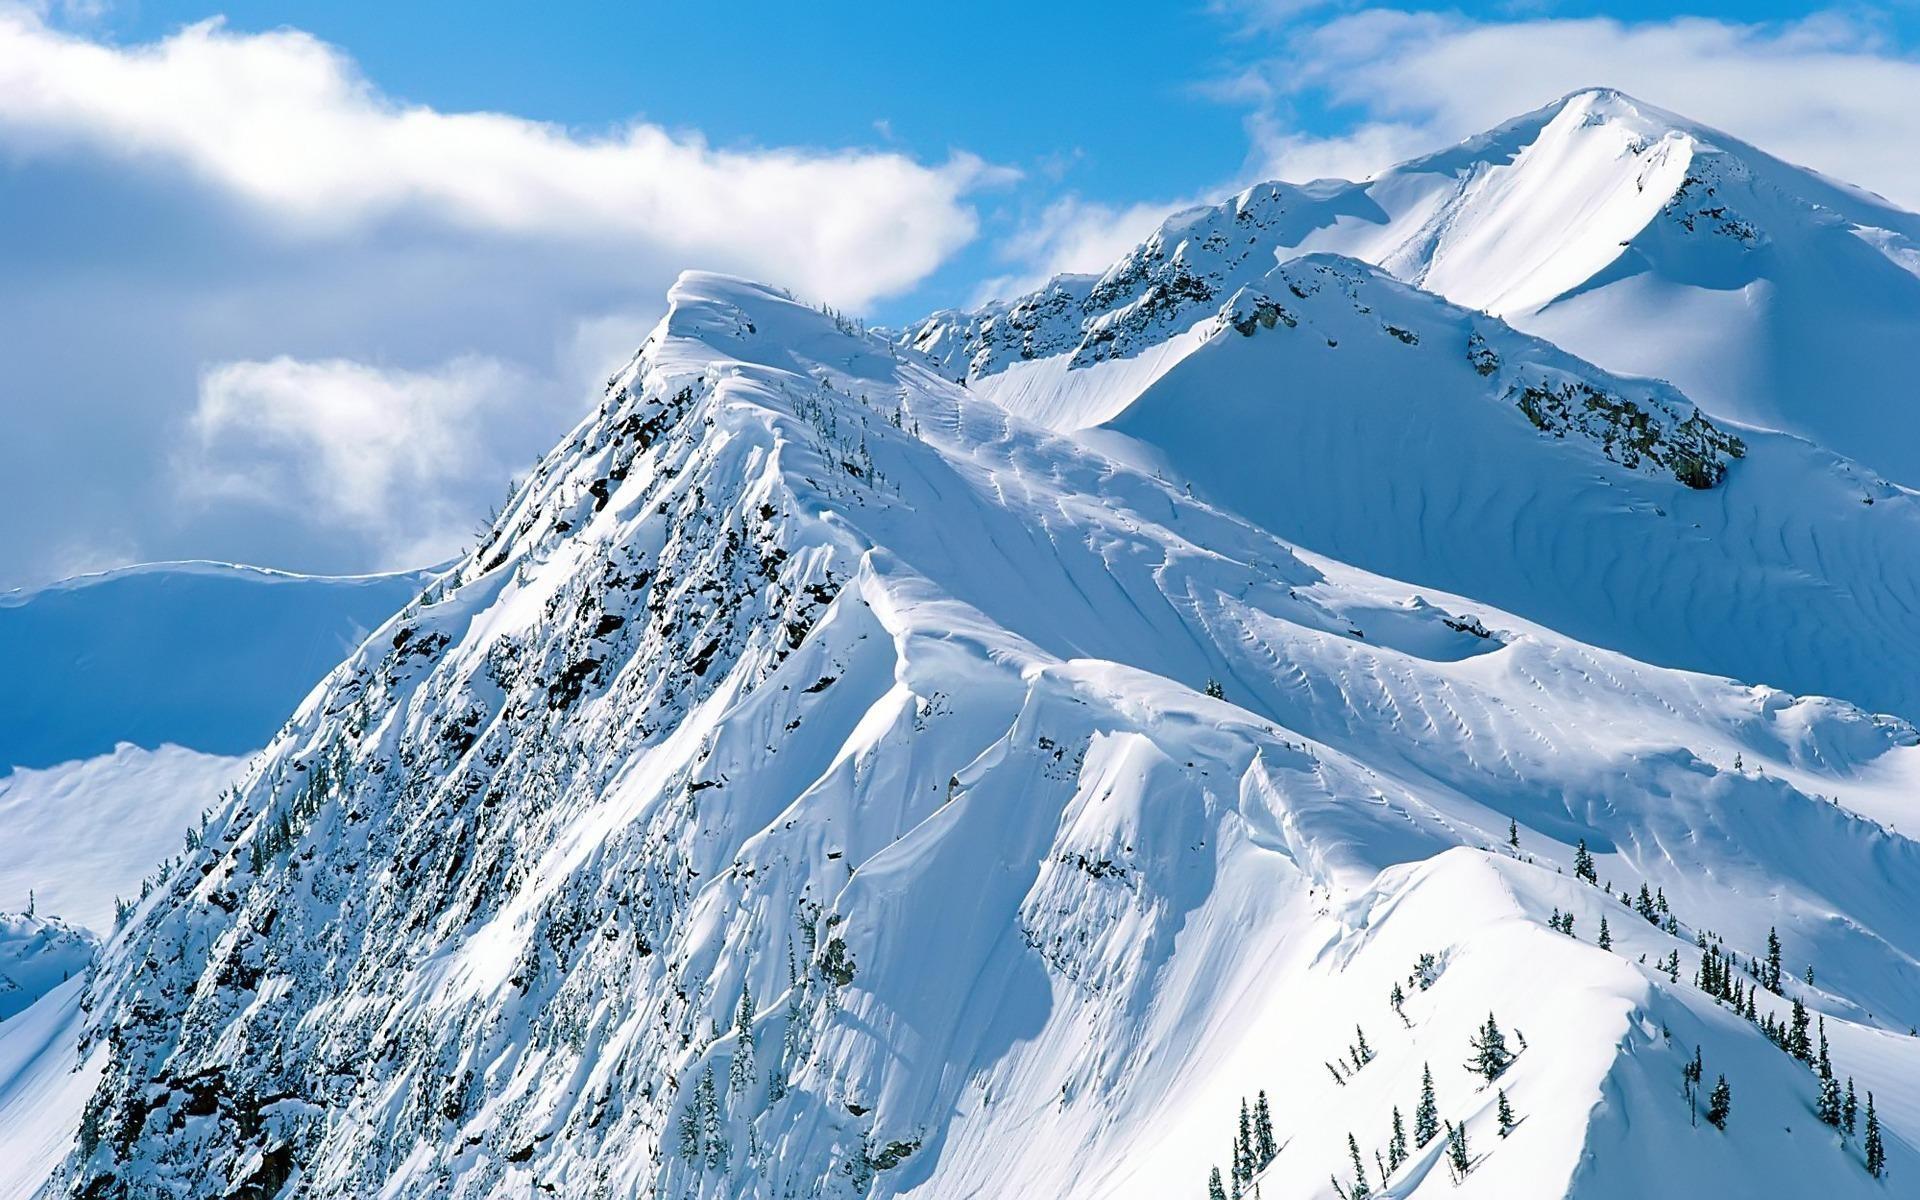 Snow Mountain wallpapers and stock photos